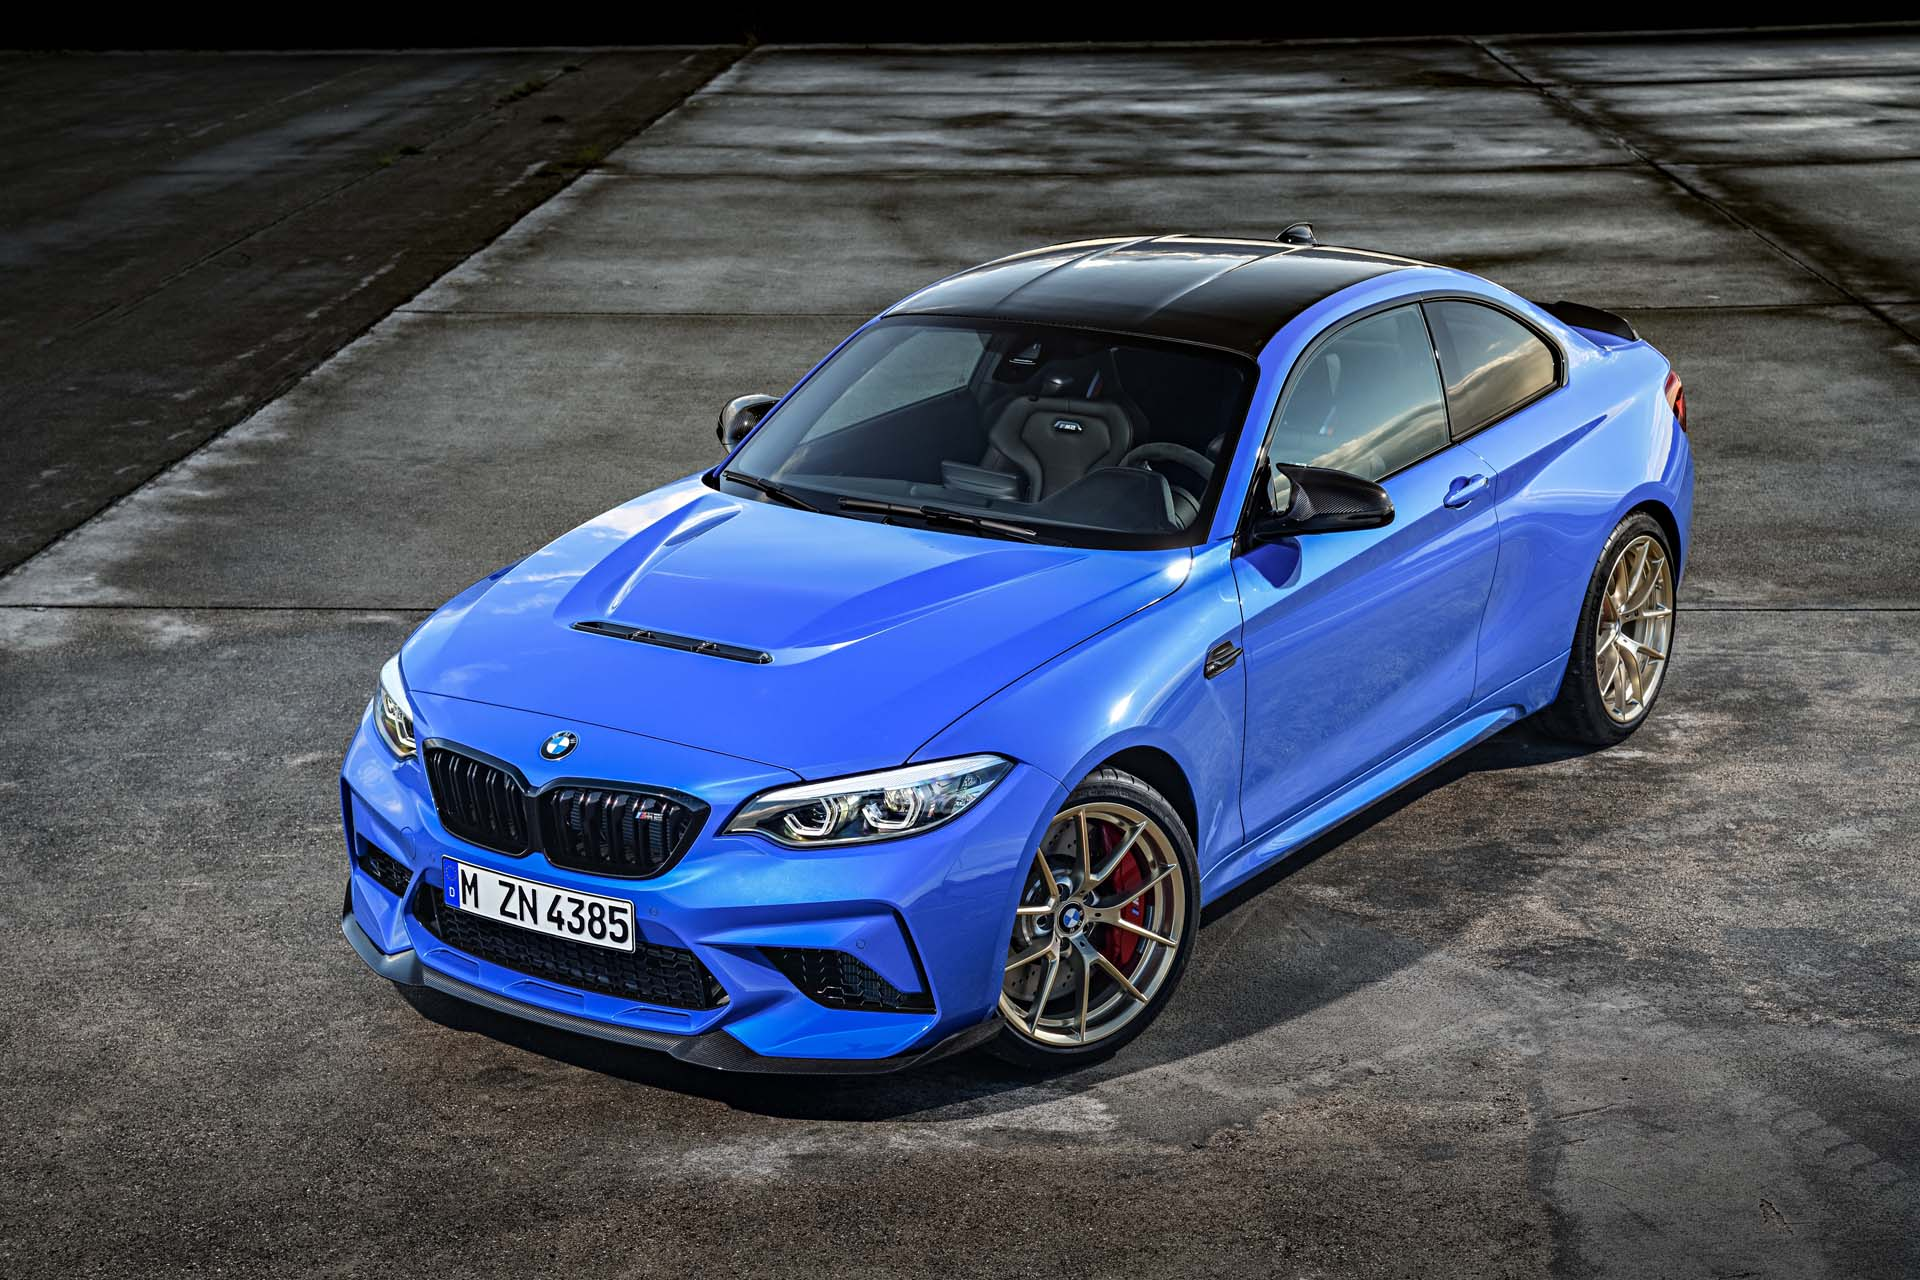 2016 - [BMW] M2 [F87] - Page 11 2020-bmw-2-series_100722756_h